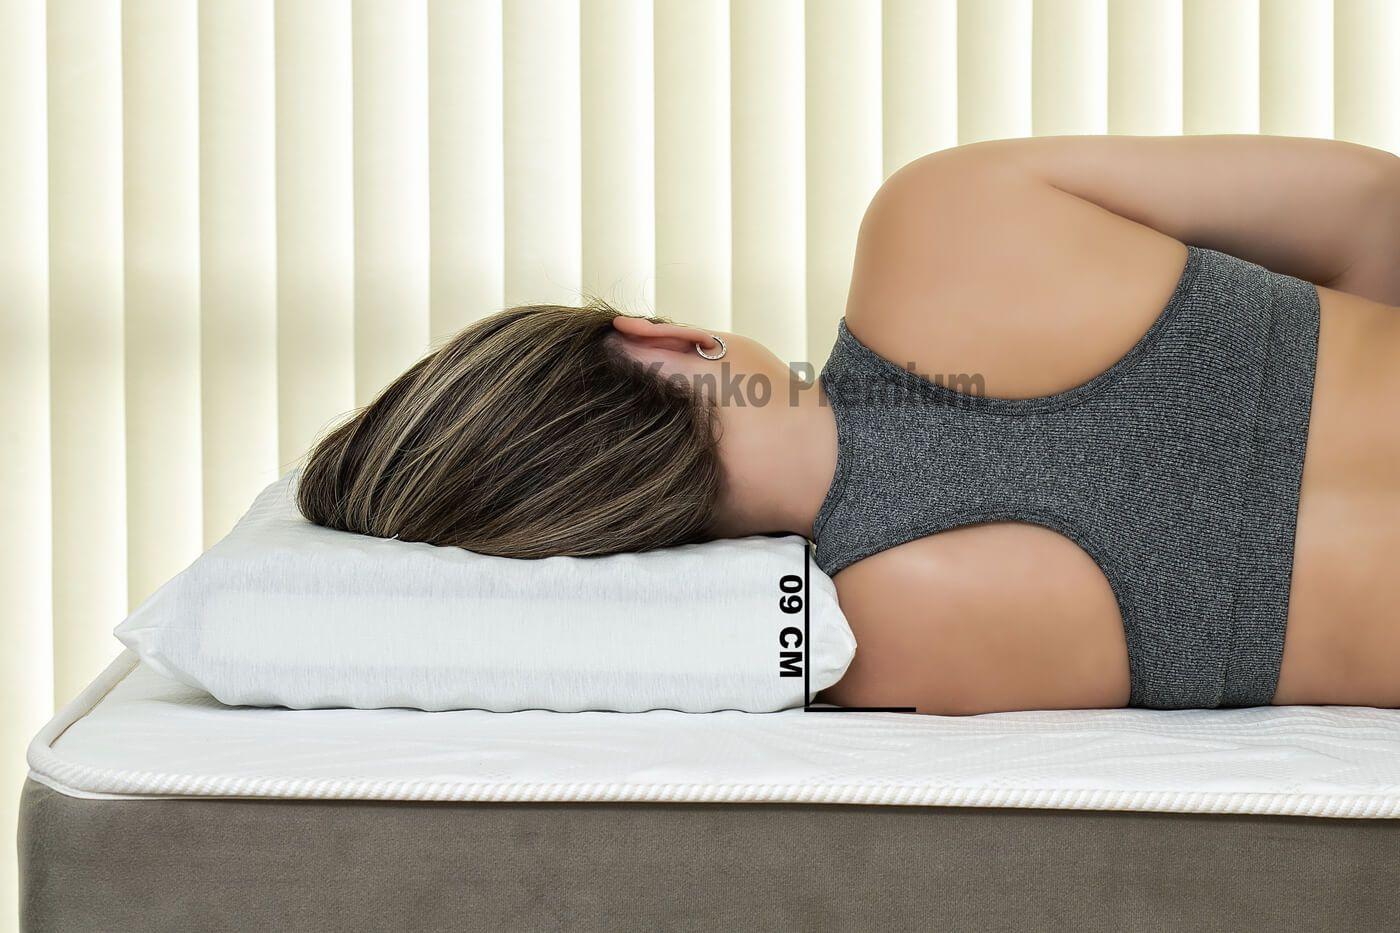 Travesseiro Magnético Standart 09cm Kenko Premium   - Kenko Premium Colchões